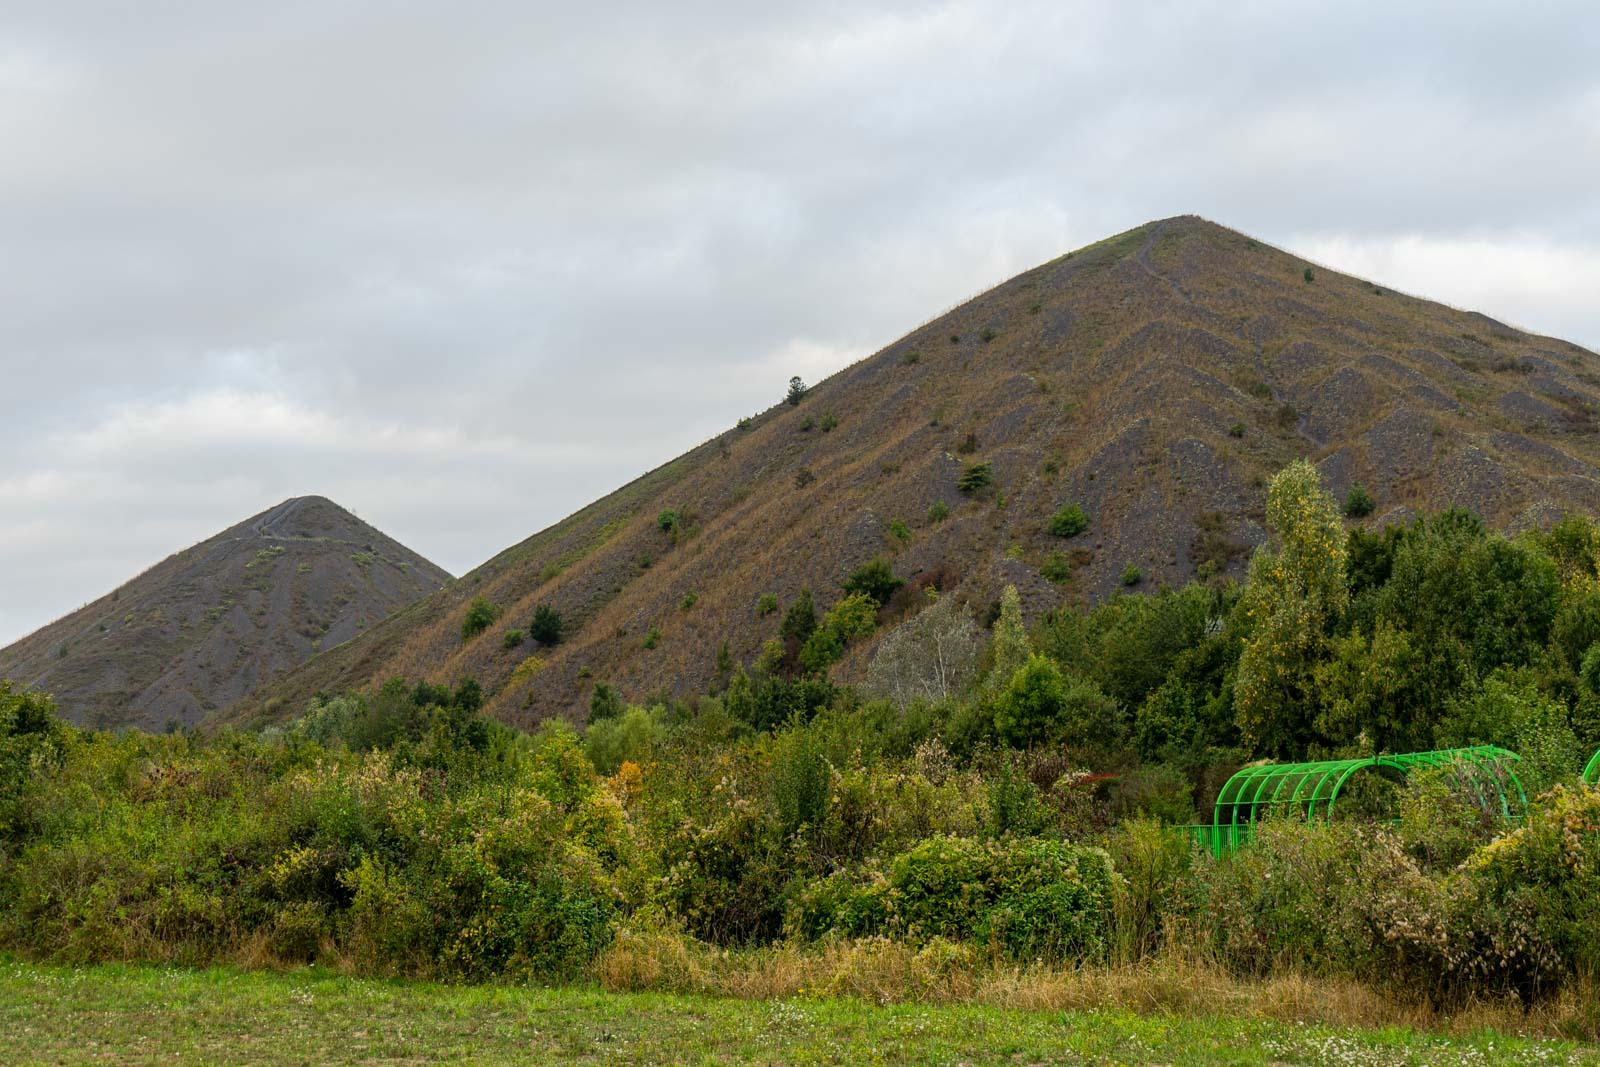 11/9 Mining Pit, Loos-en-Gohelle